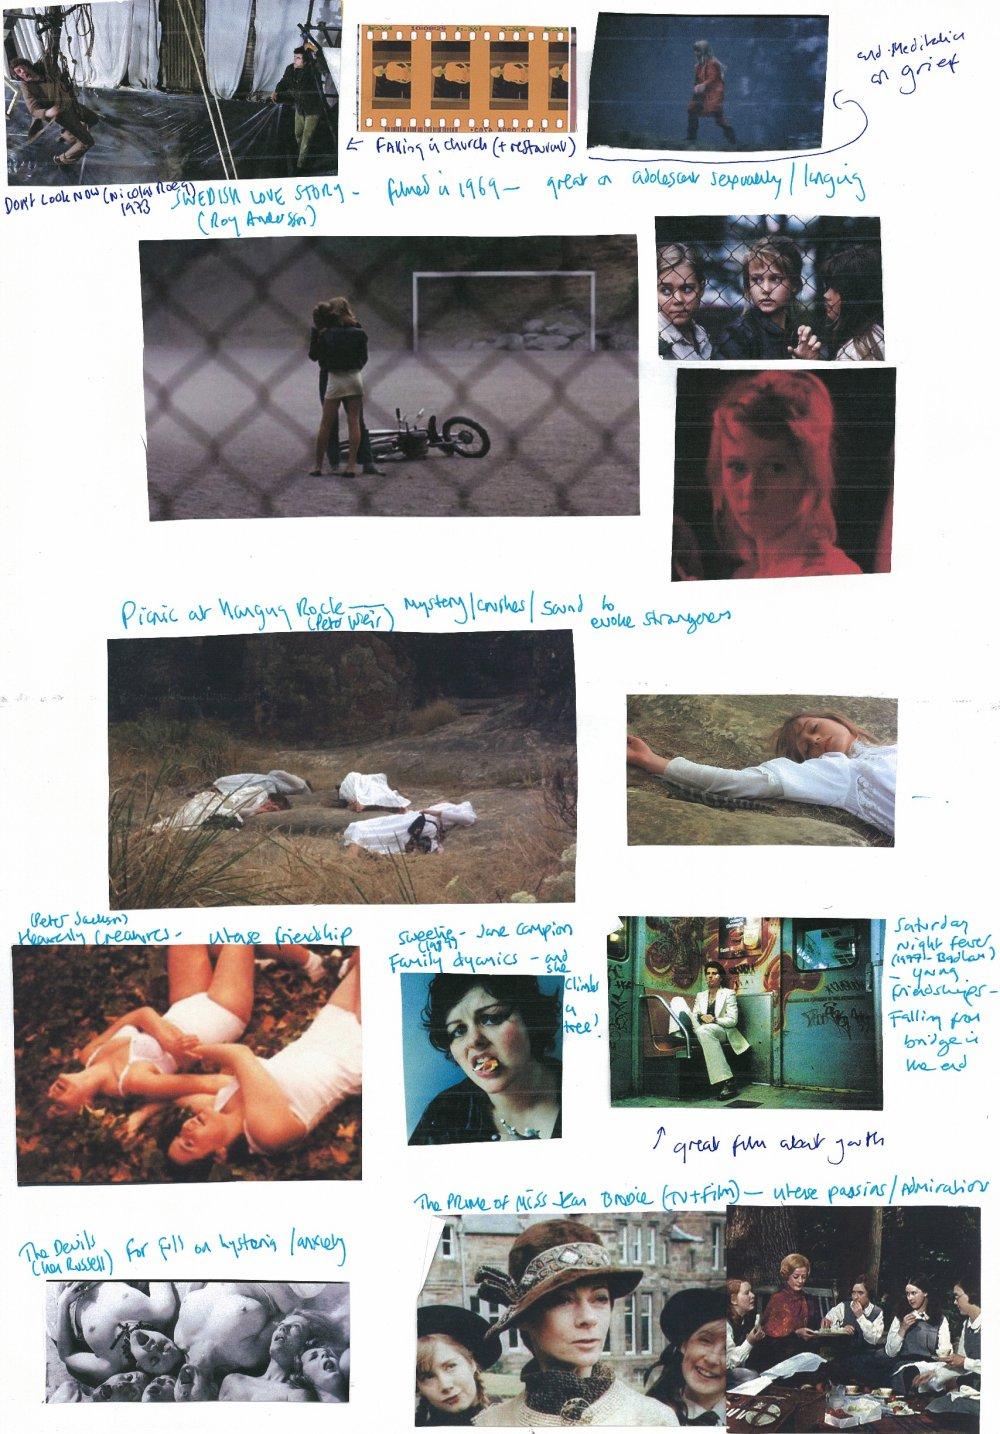 Carol Morley's scrapbook for The Falling (2014)